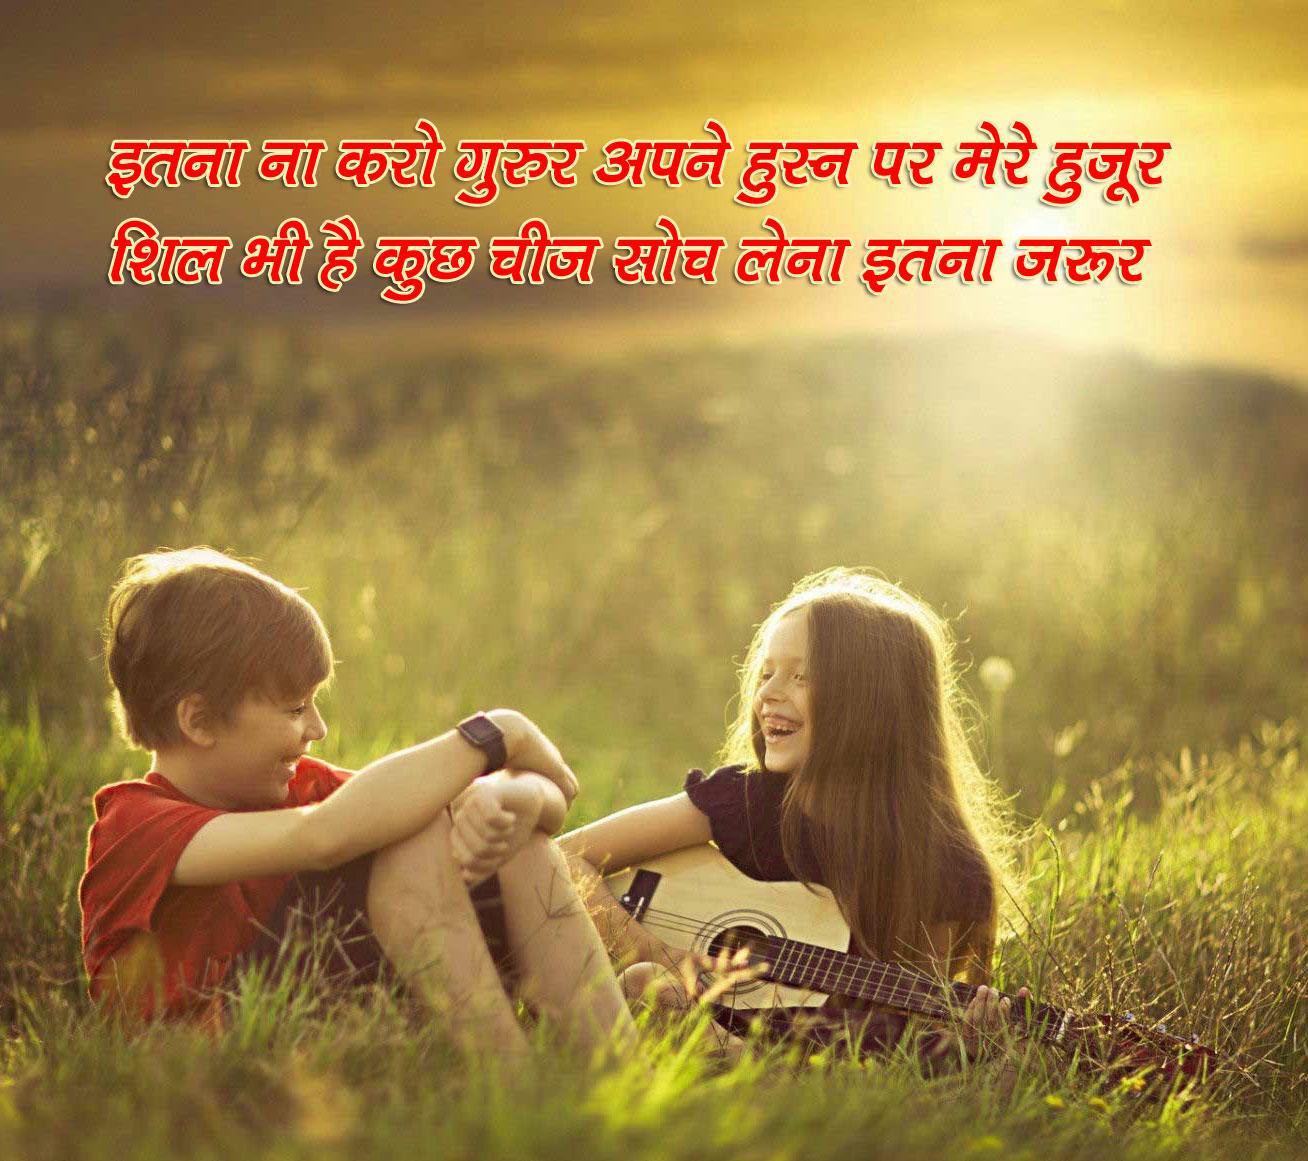 Best Hindi Shayari Images 37